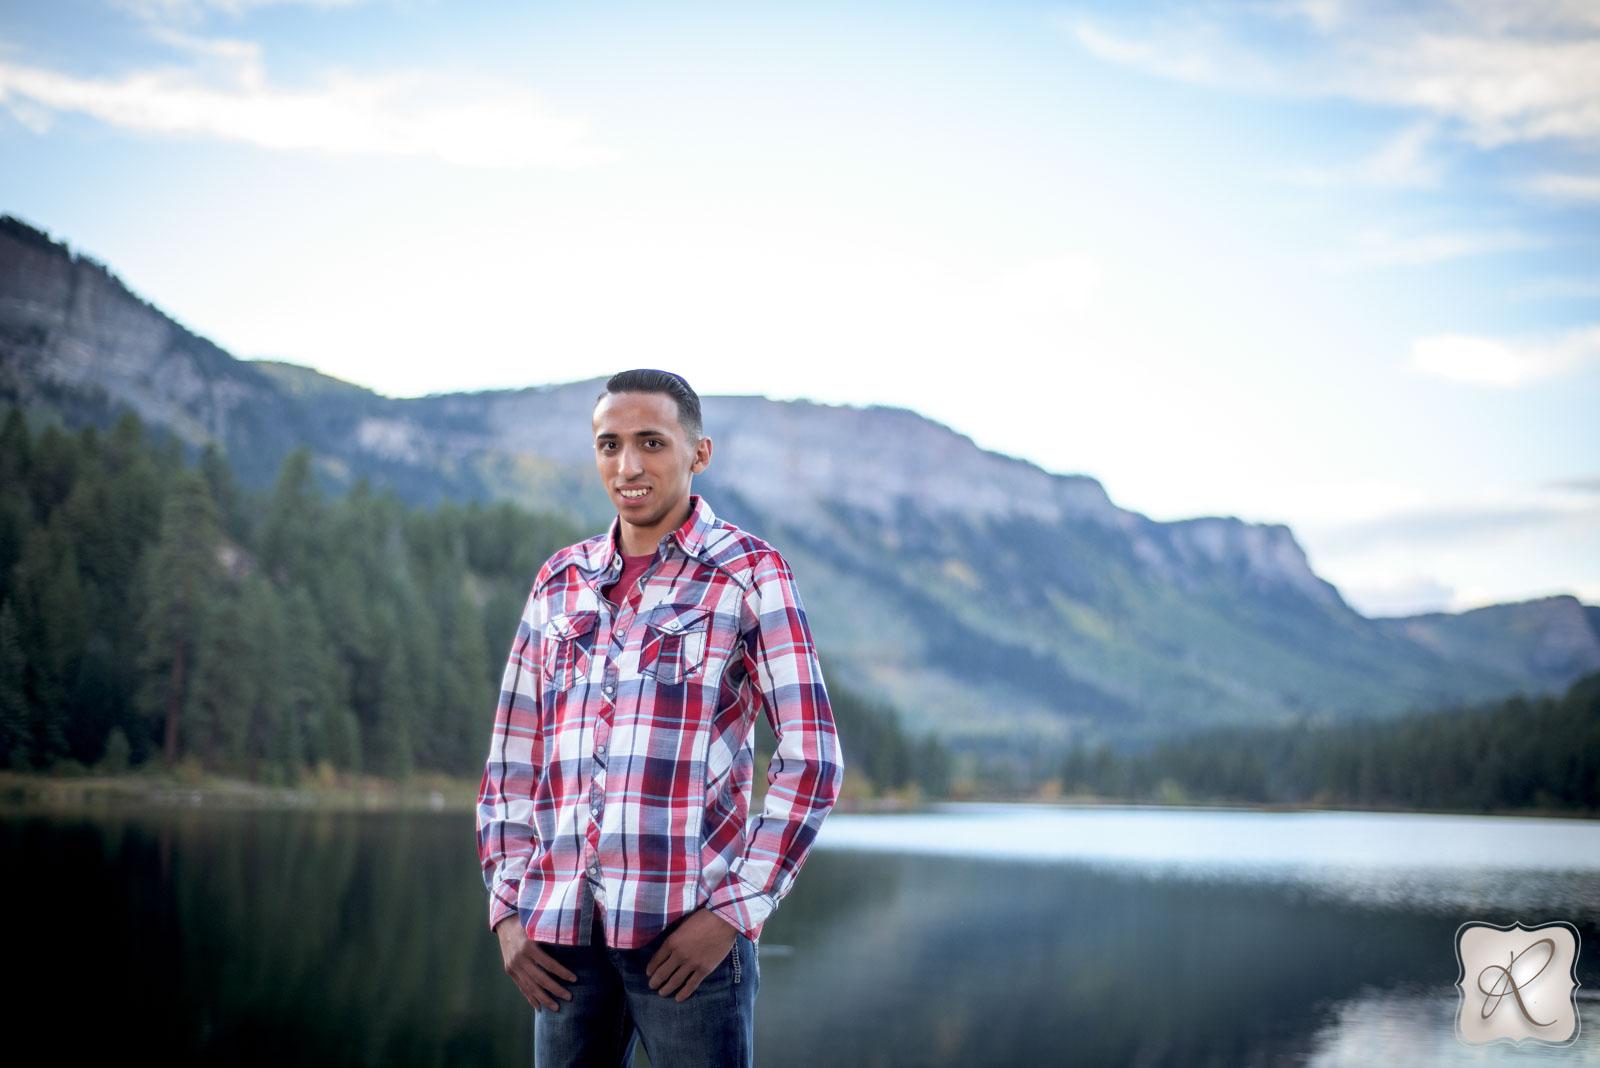 Durango Colorado scenery professional photography